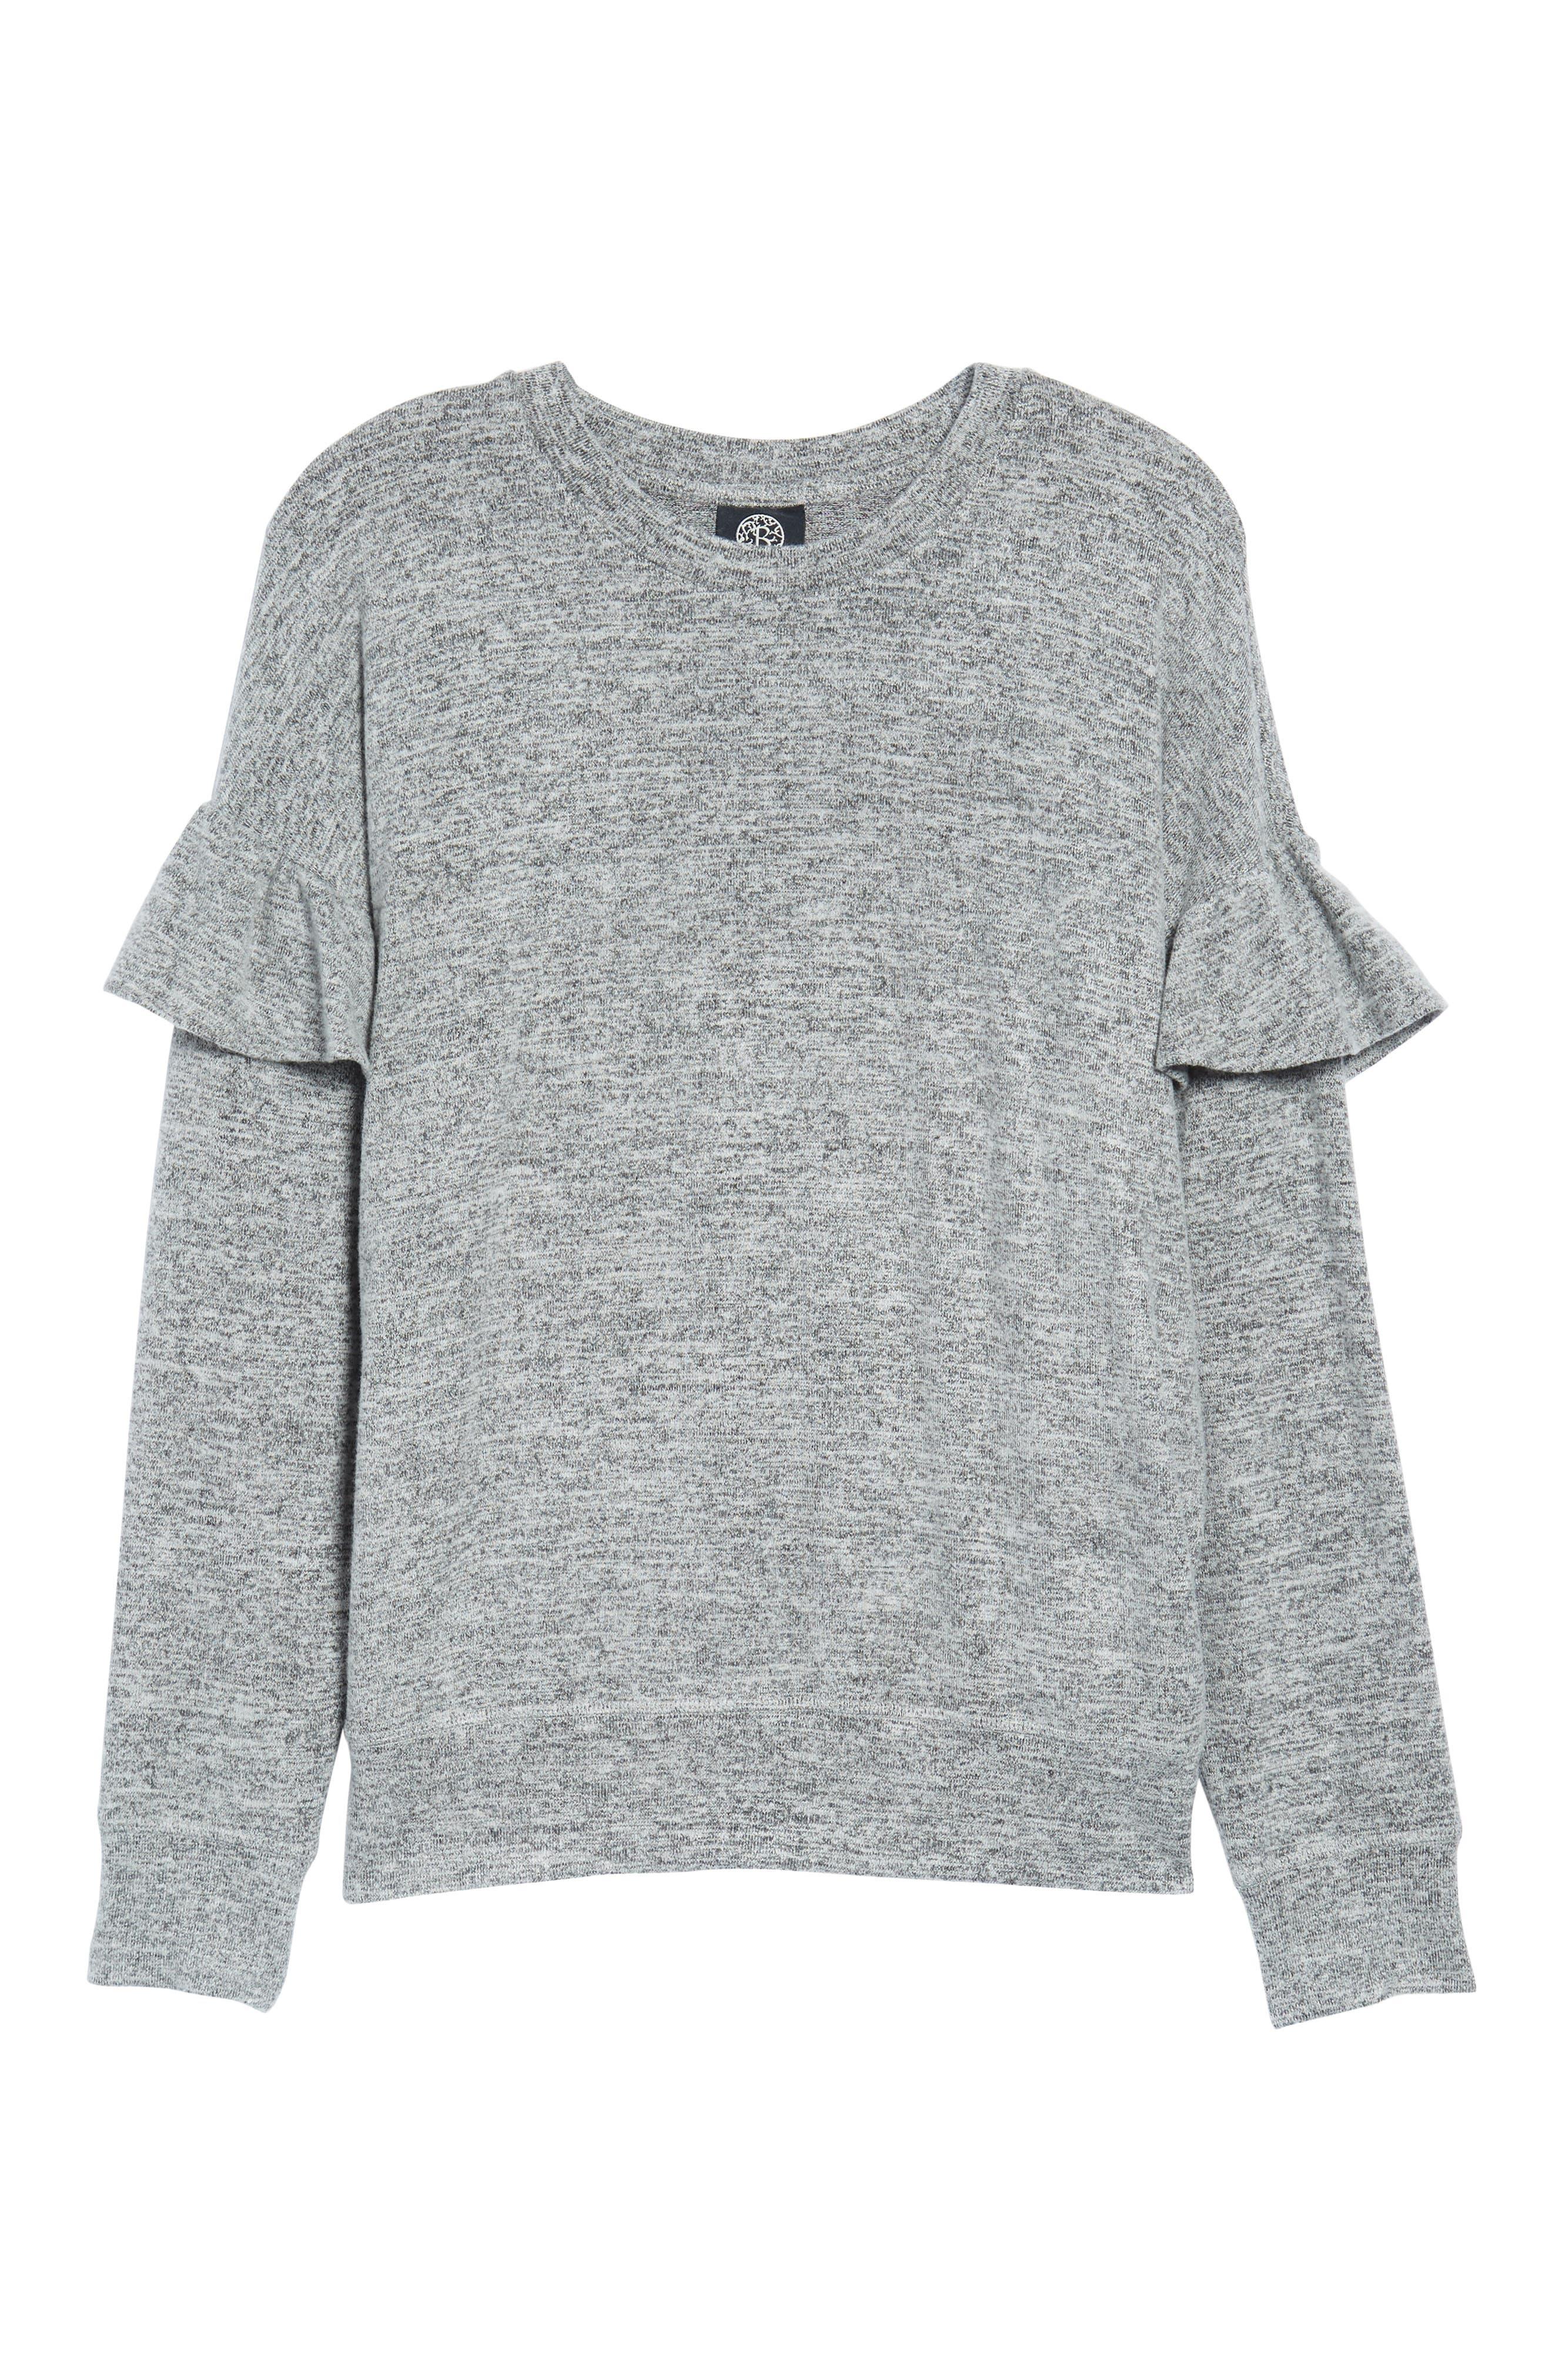 Ruffle Sleeve Sweatshirt,                             Alternate thumbnail 6, color,                             100